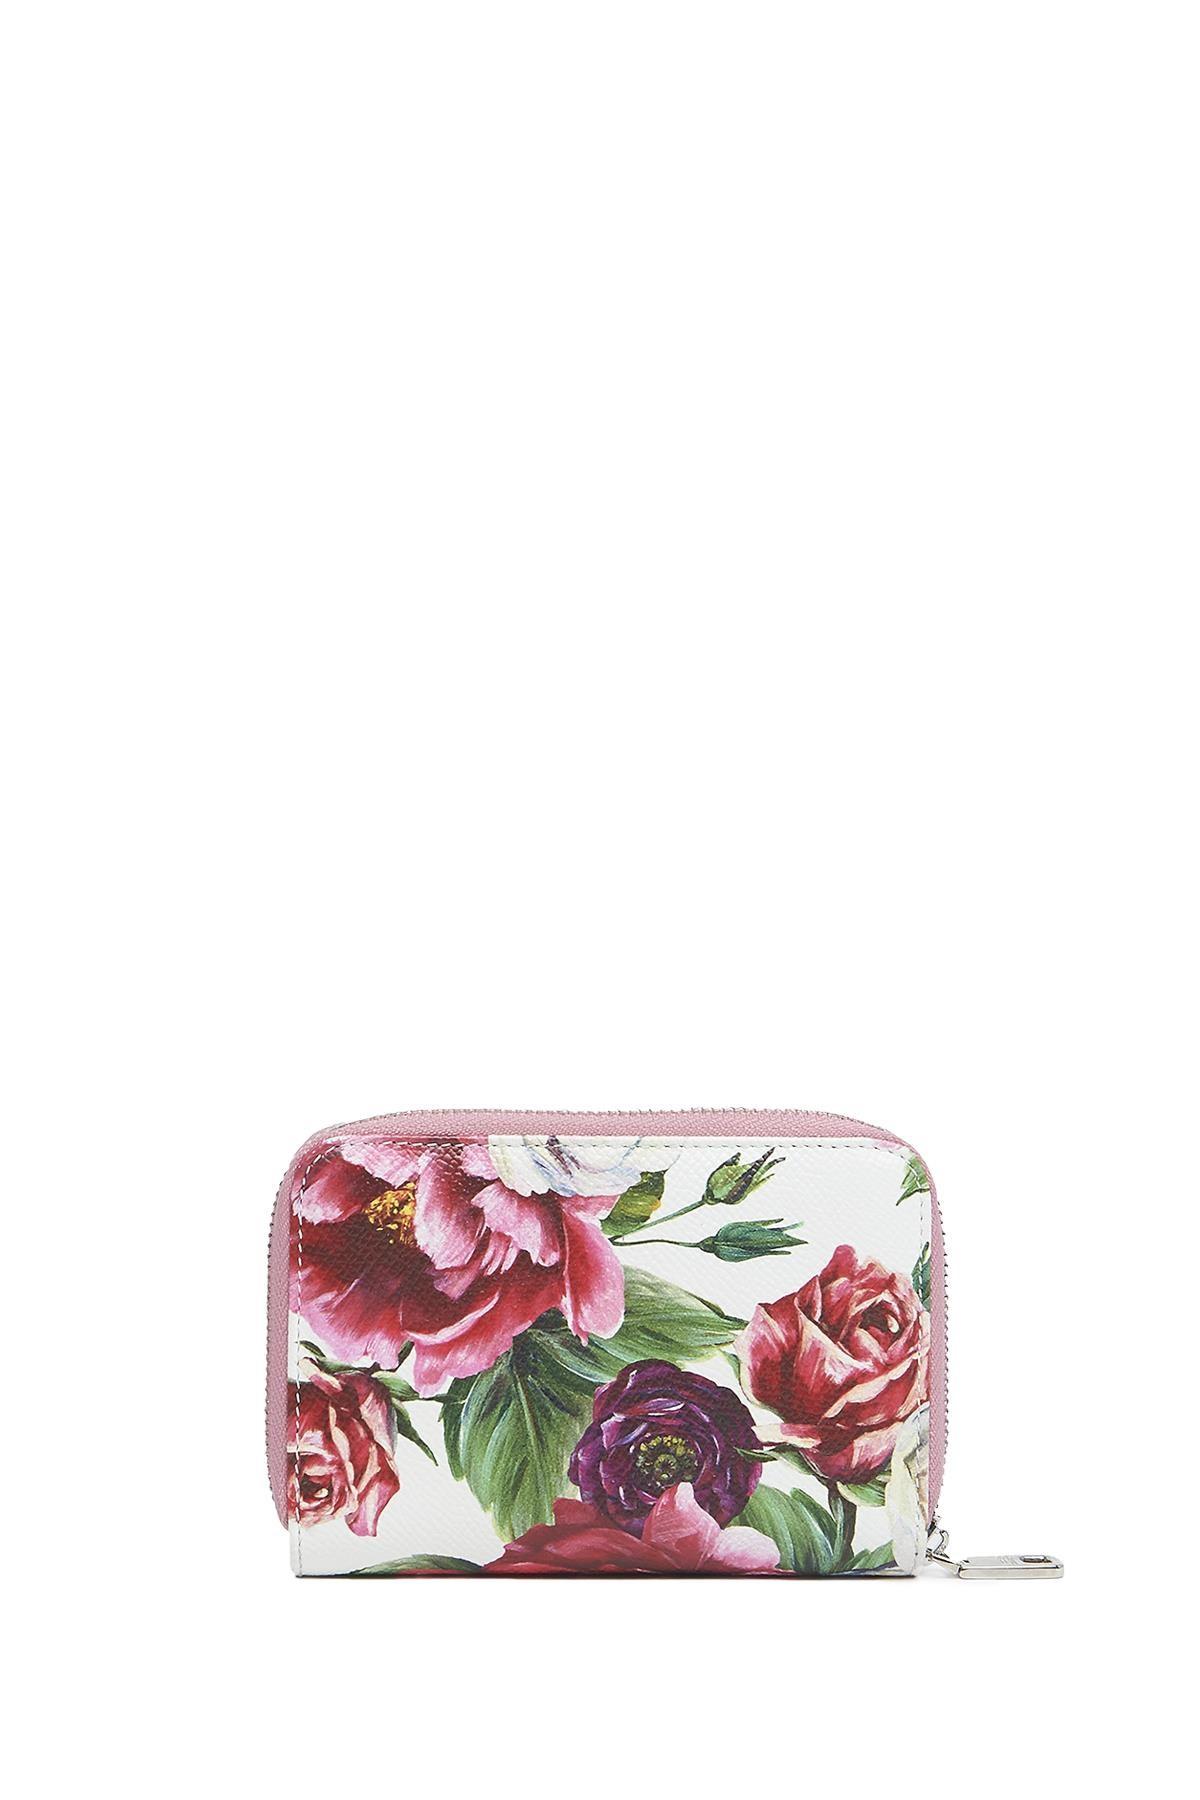 Gabbana Cod Gabbana Wallet Dolce Peony Dolce Cod Dolce Wallet Peony qBYAW